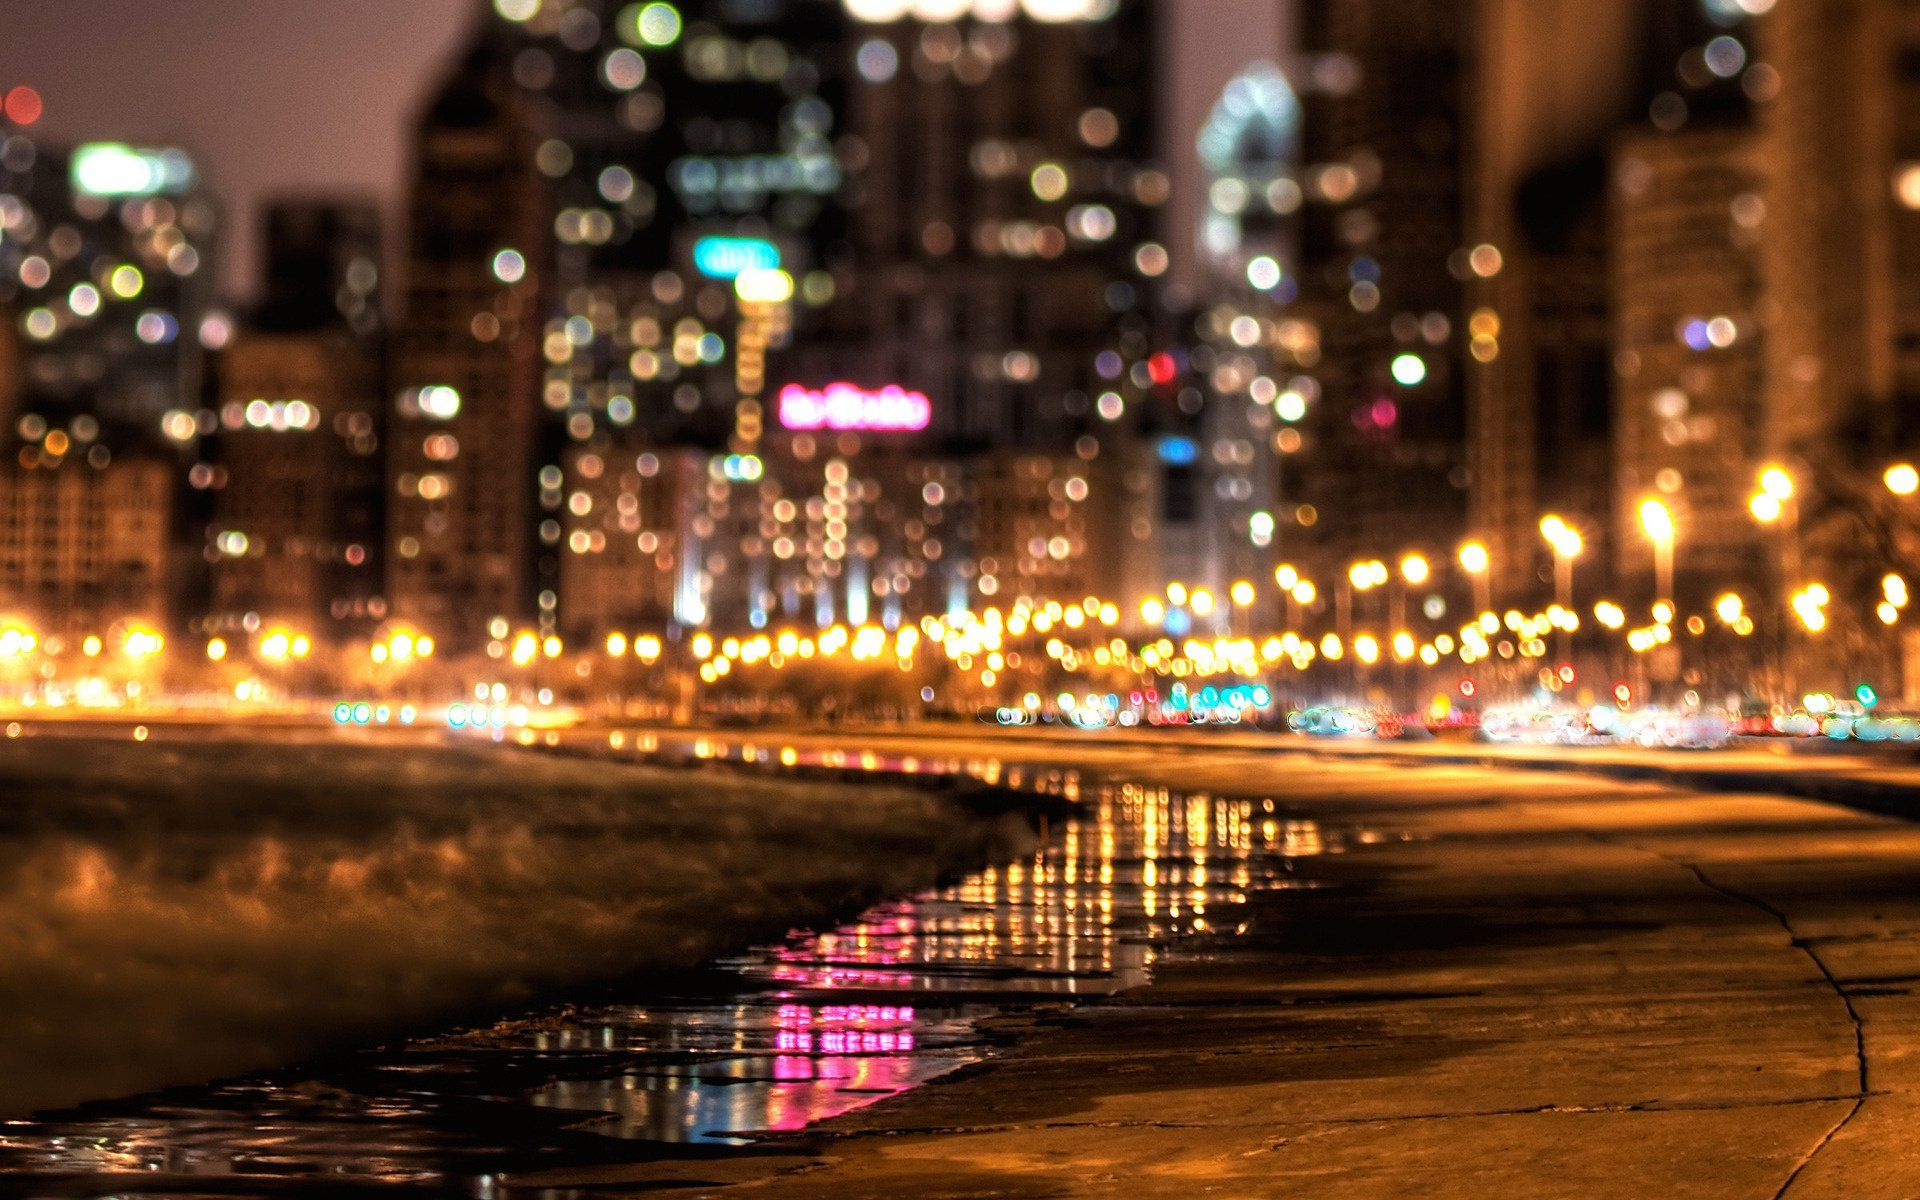 Ночная москва фото 10 фотография